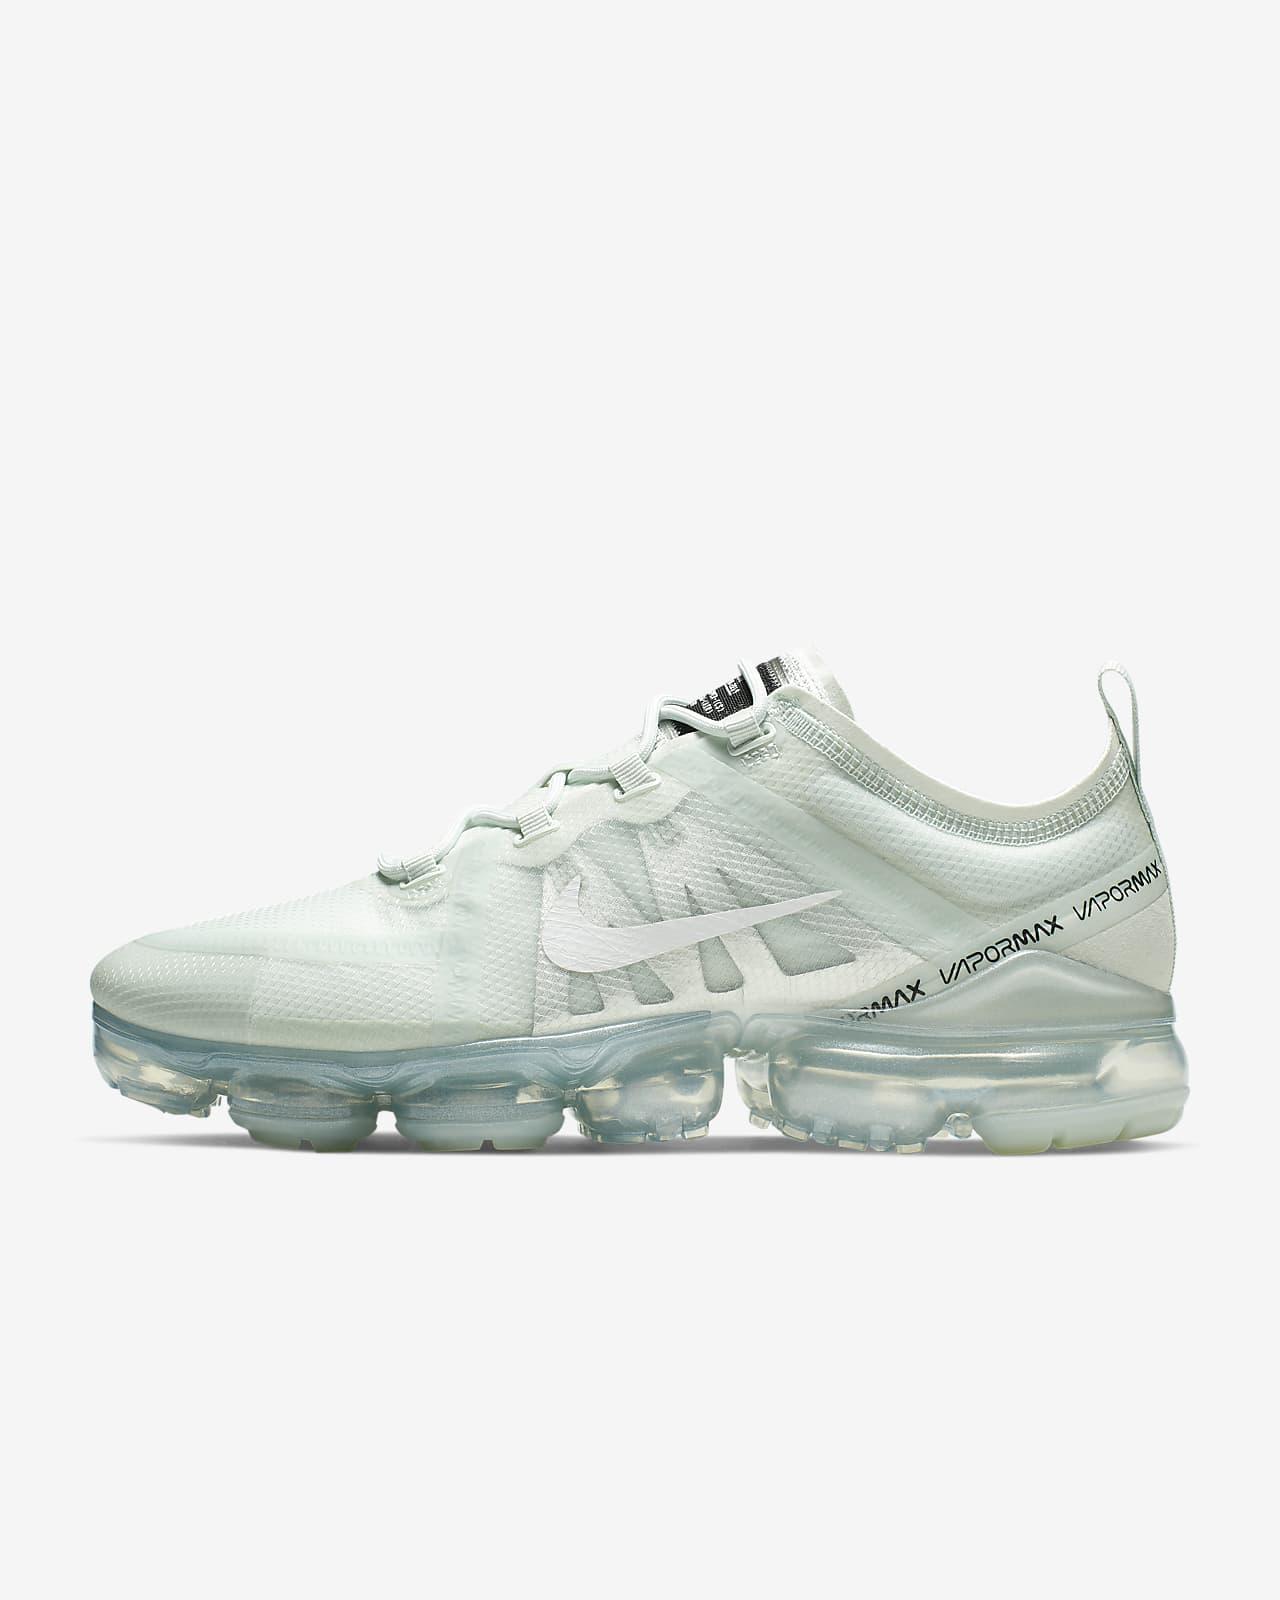 nike zapatos vapormax